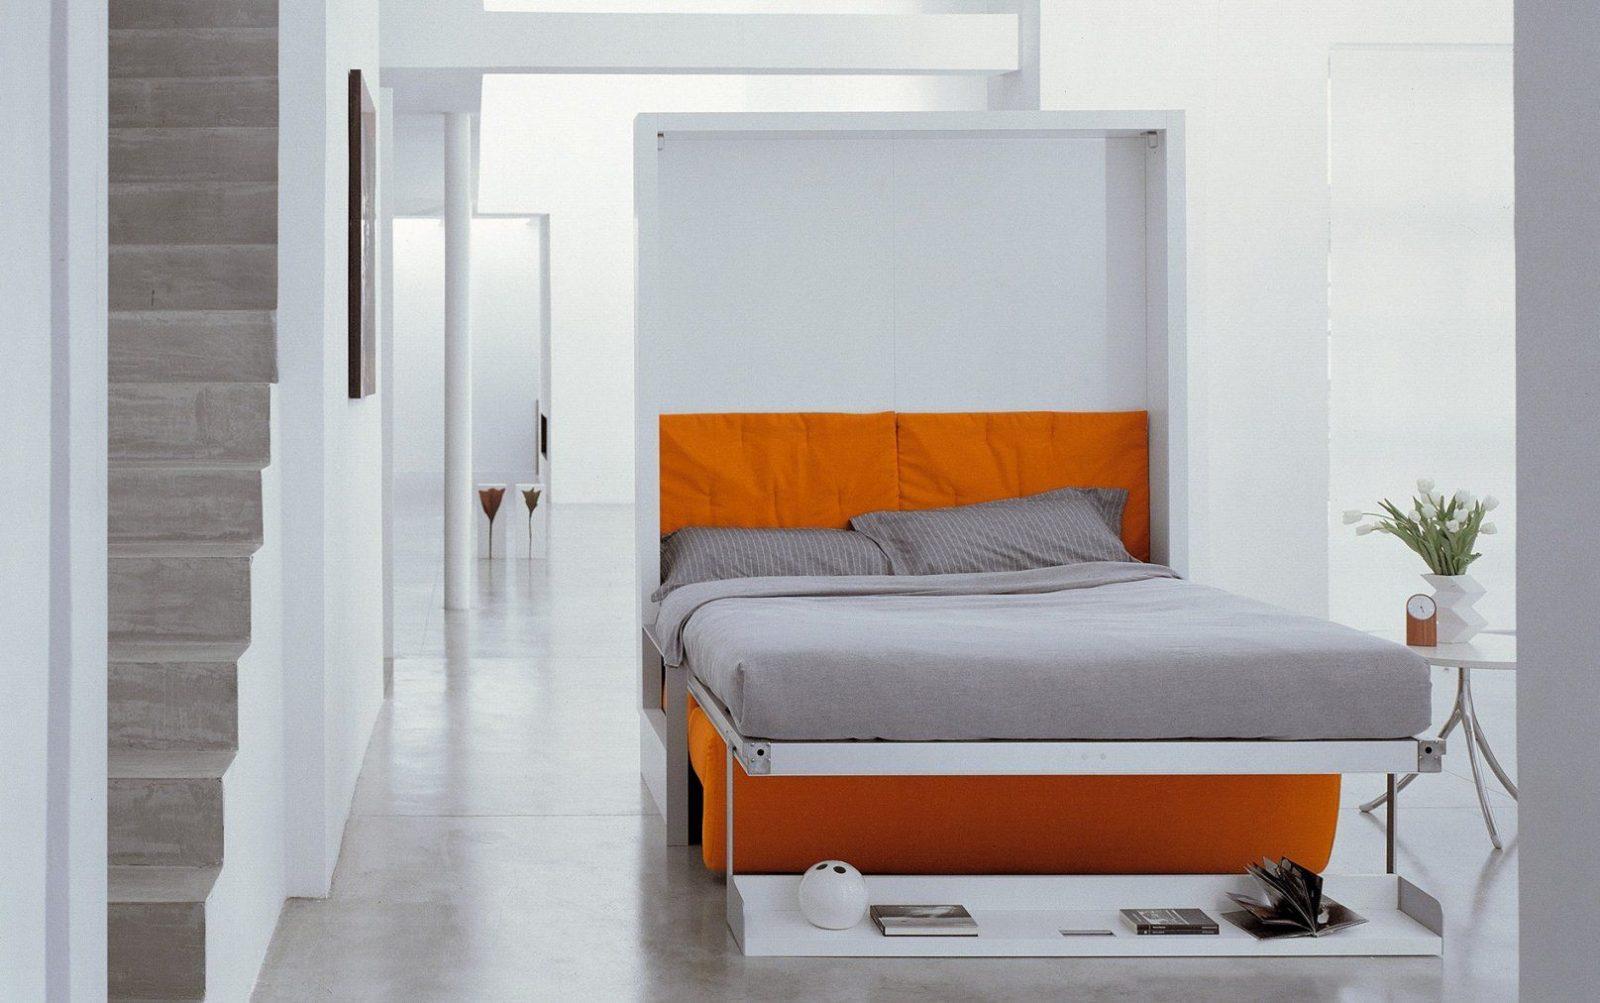 Schrankbett Mit Integriertem Sofa  Bürostuhl von Schrankbett Mit Integriertem Sofa Photo